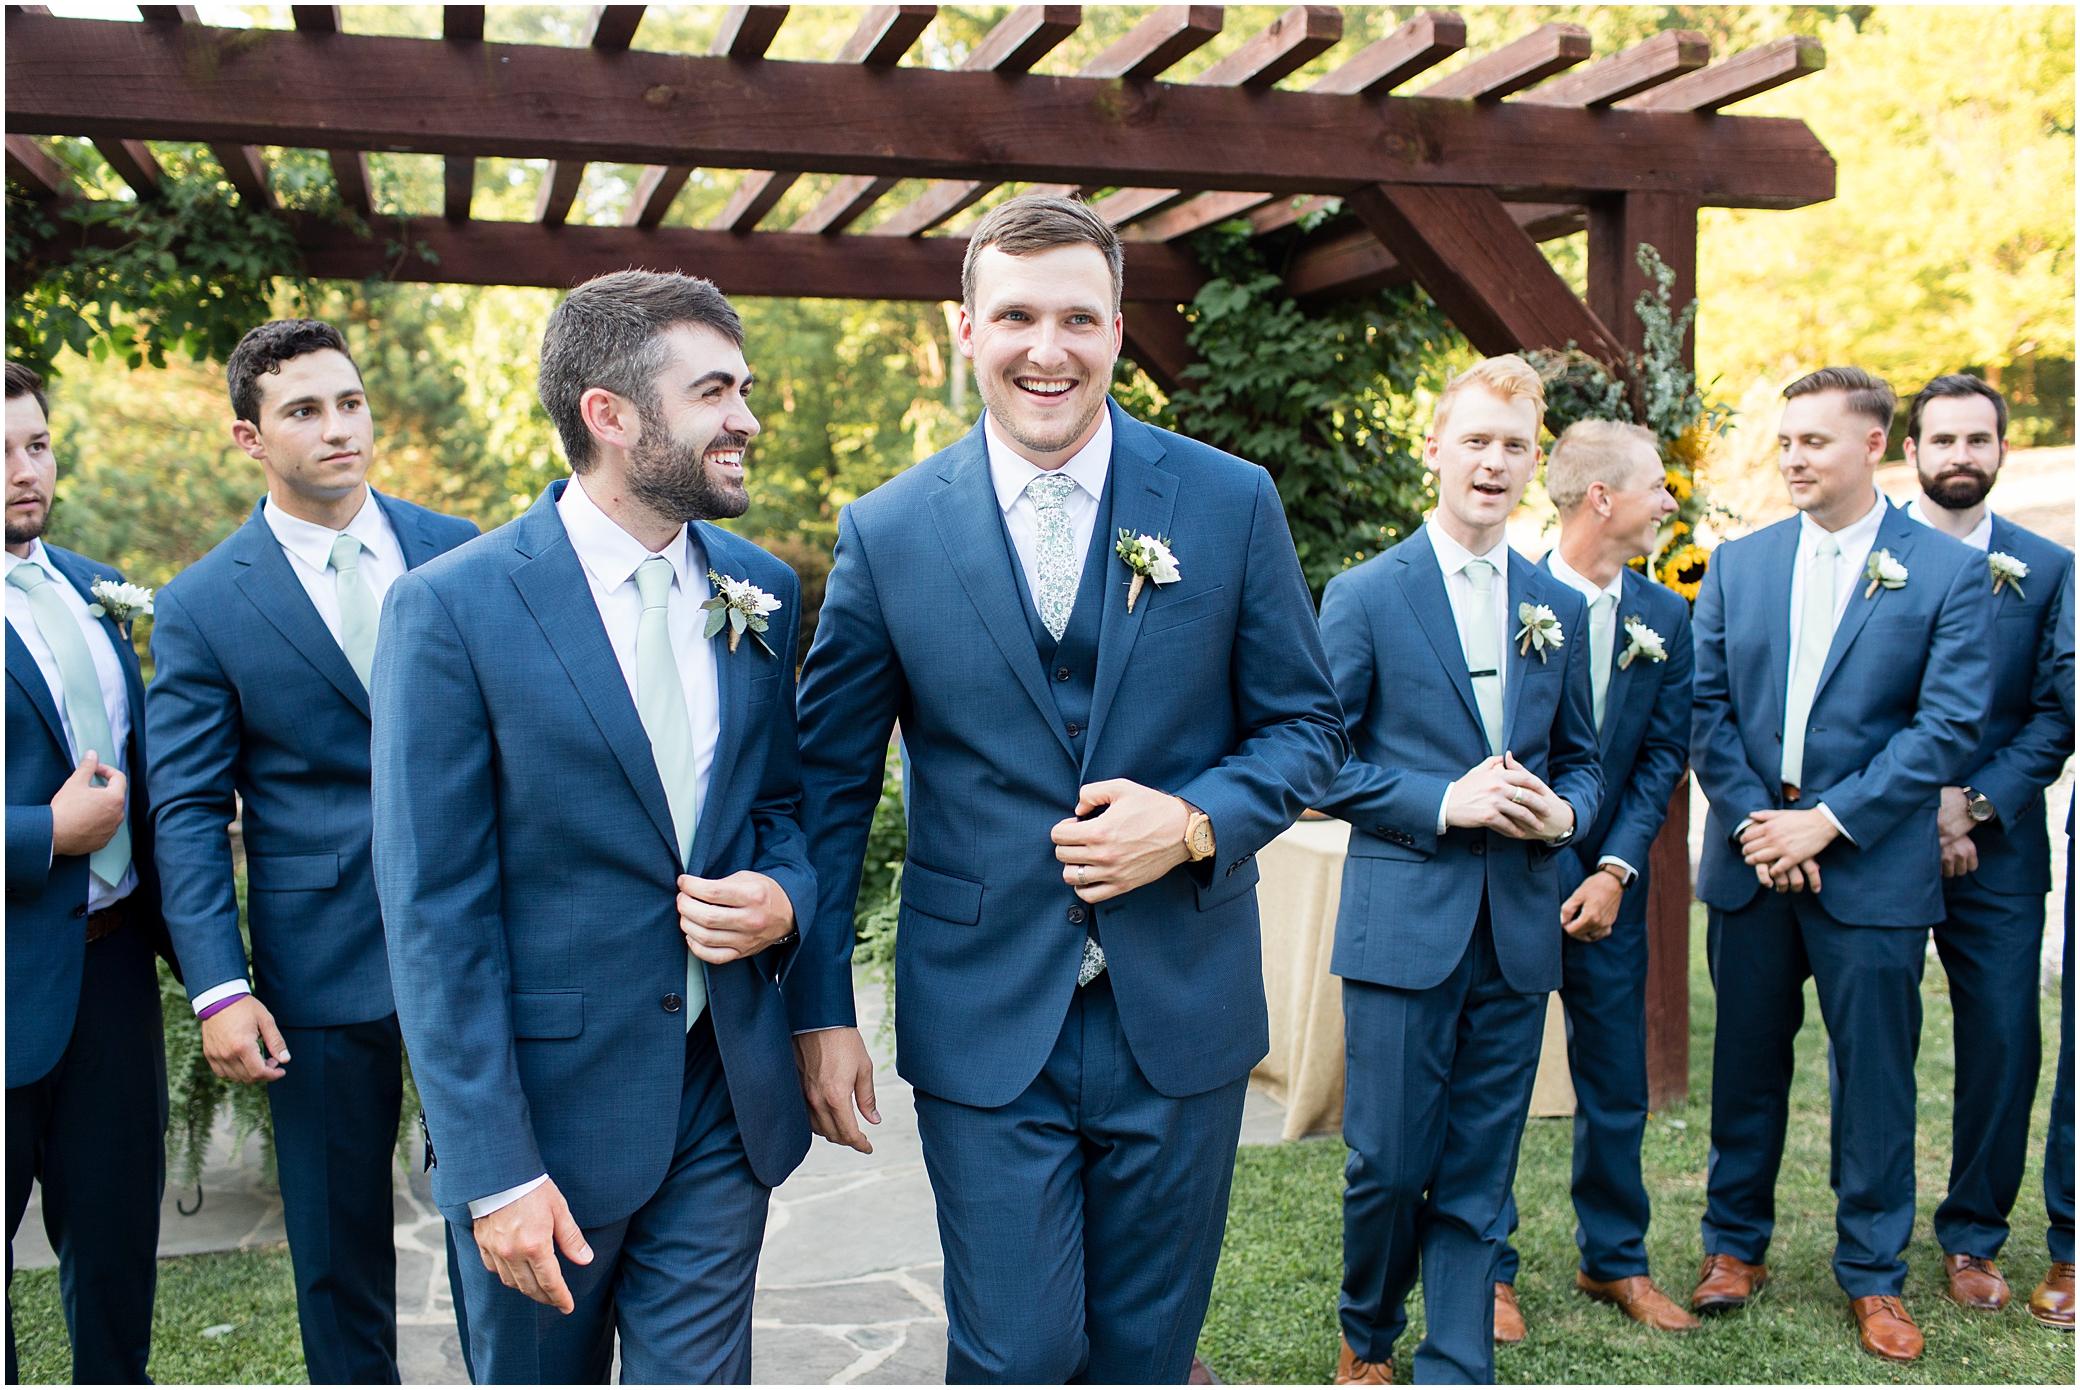 House Mountain Inn Wedding, Virginia wedding in the mountains, groomsmen